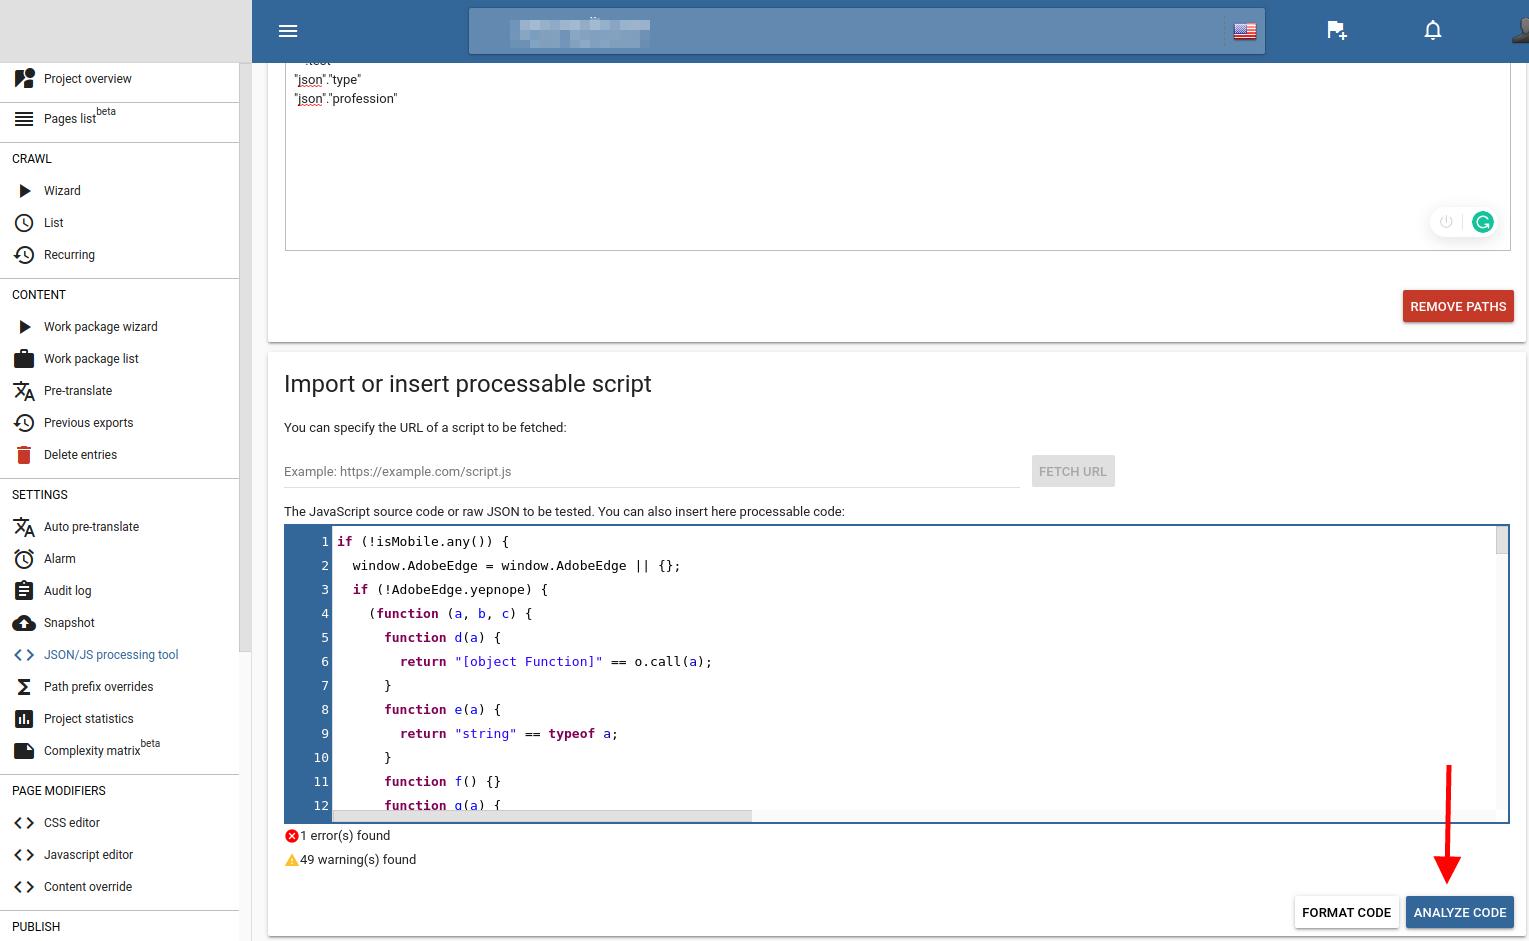 JSON path tester 3